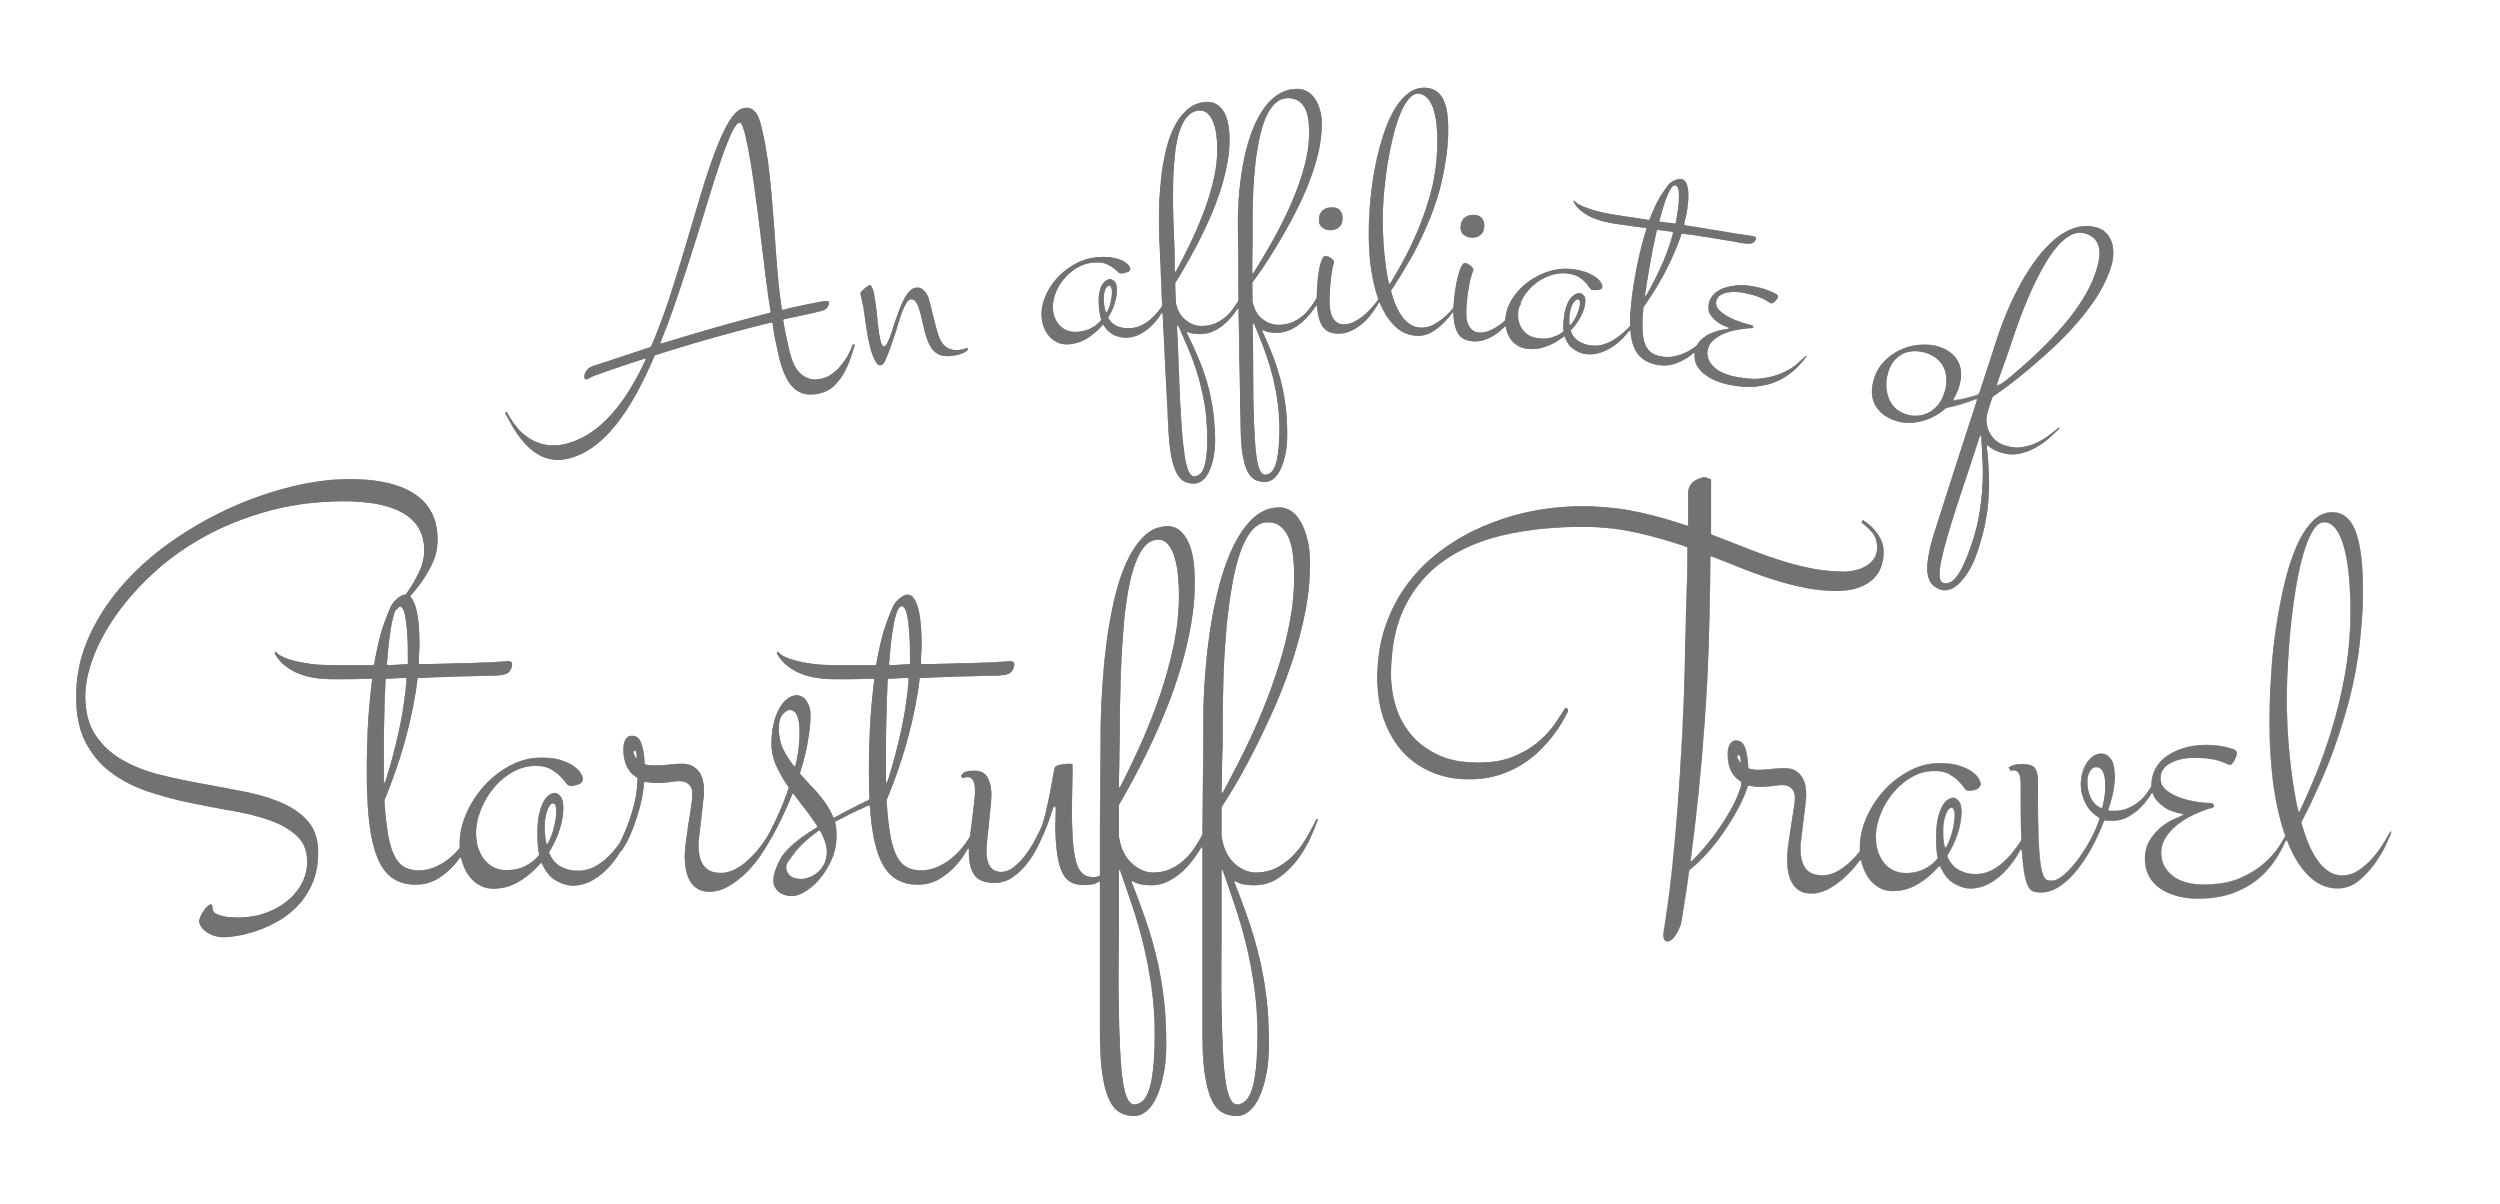 affiliateofstarstuff.png